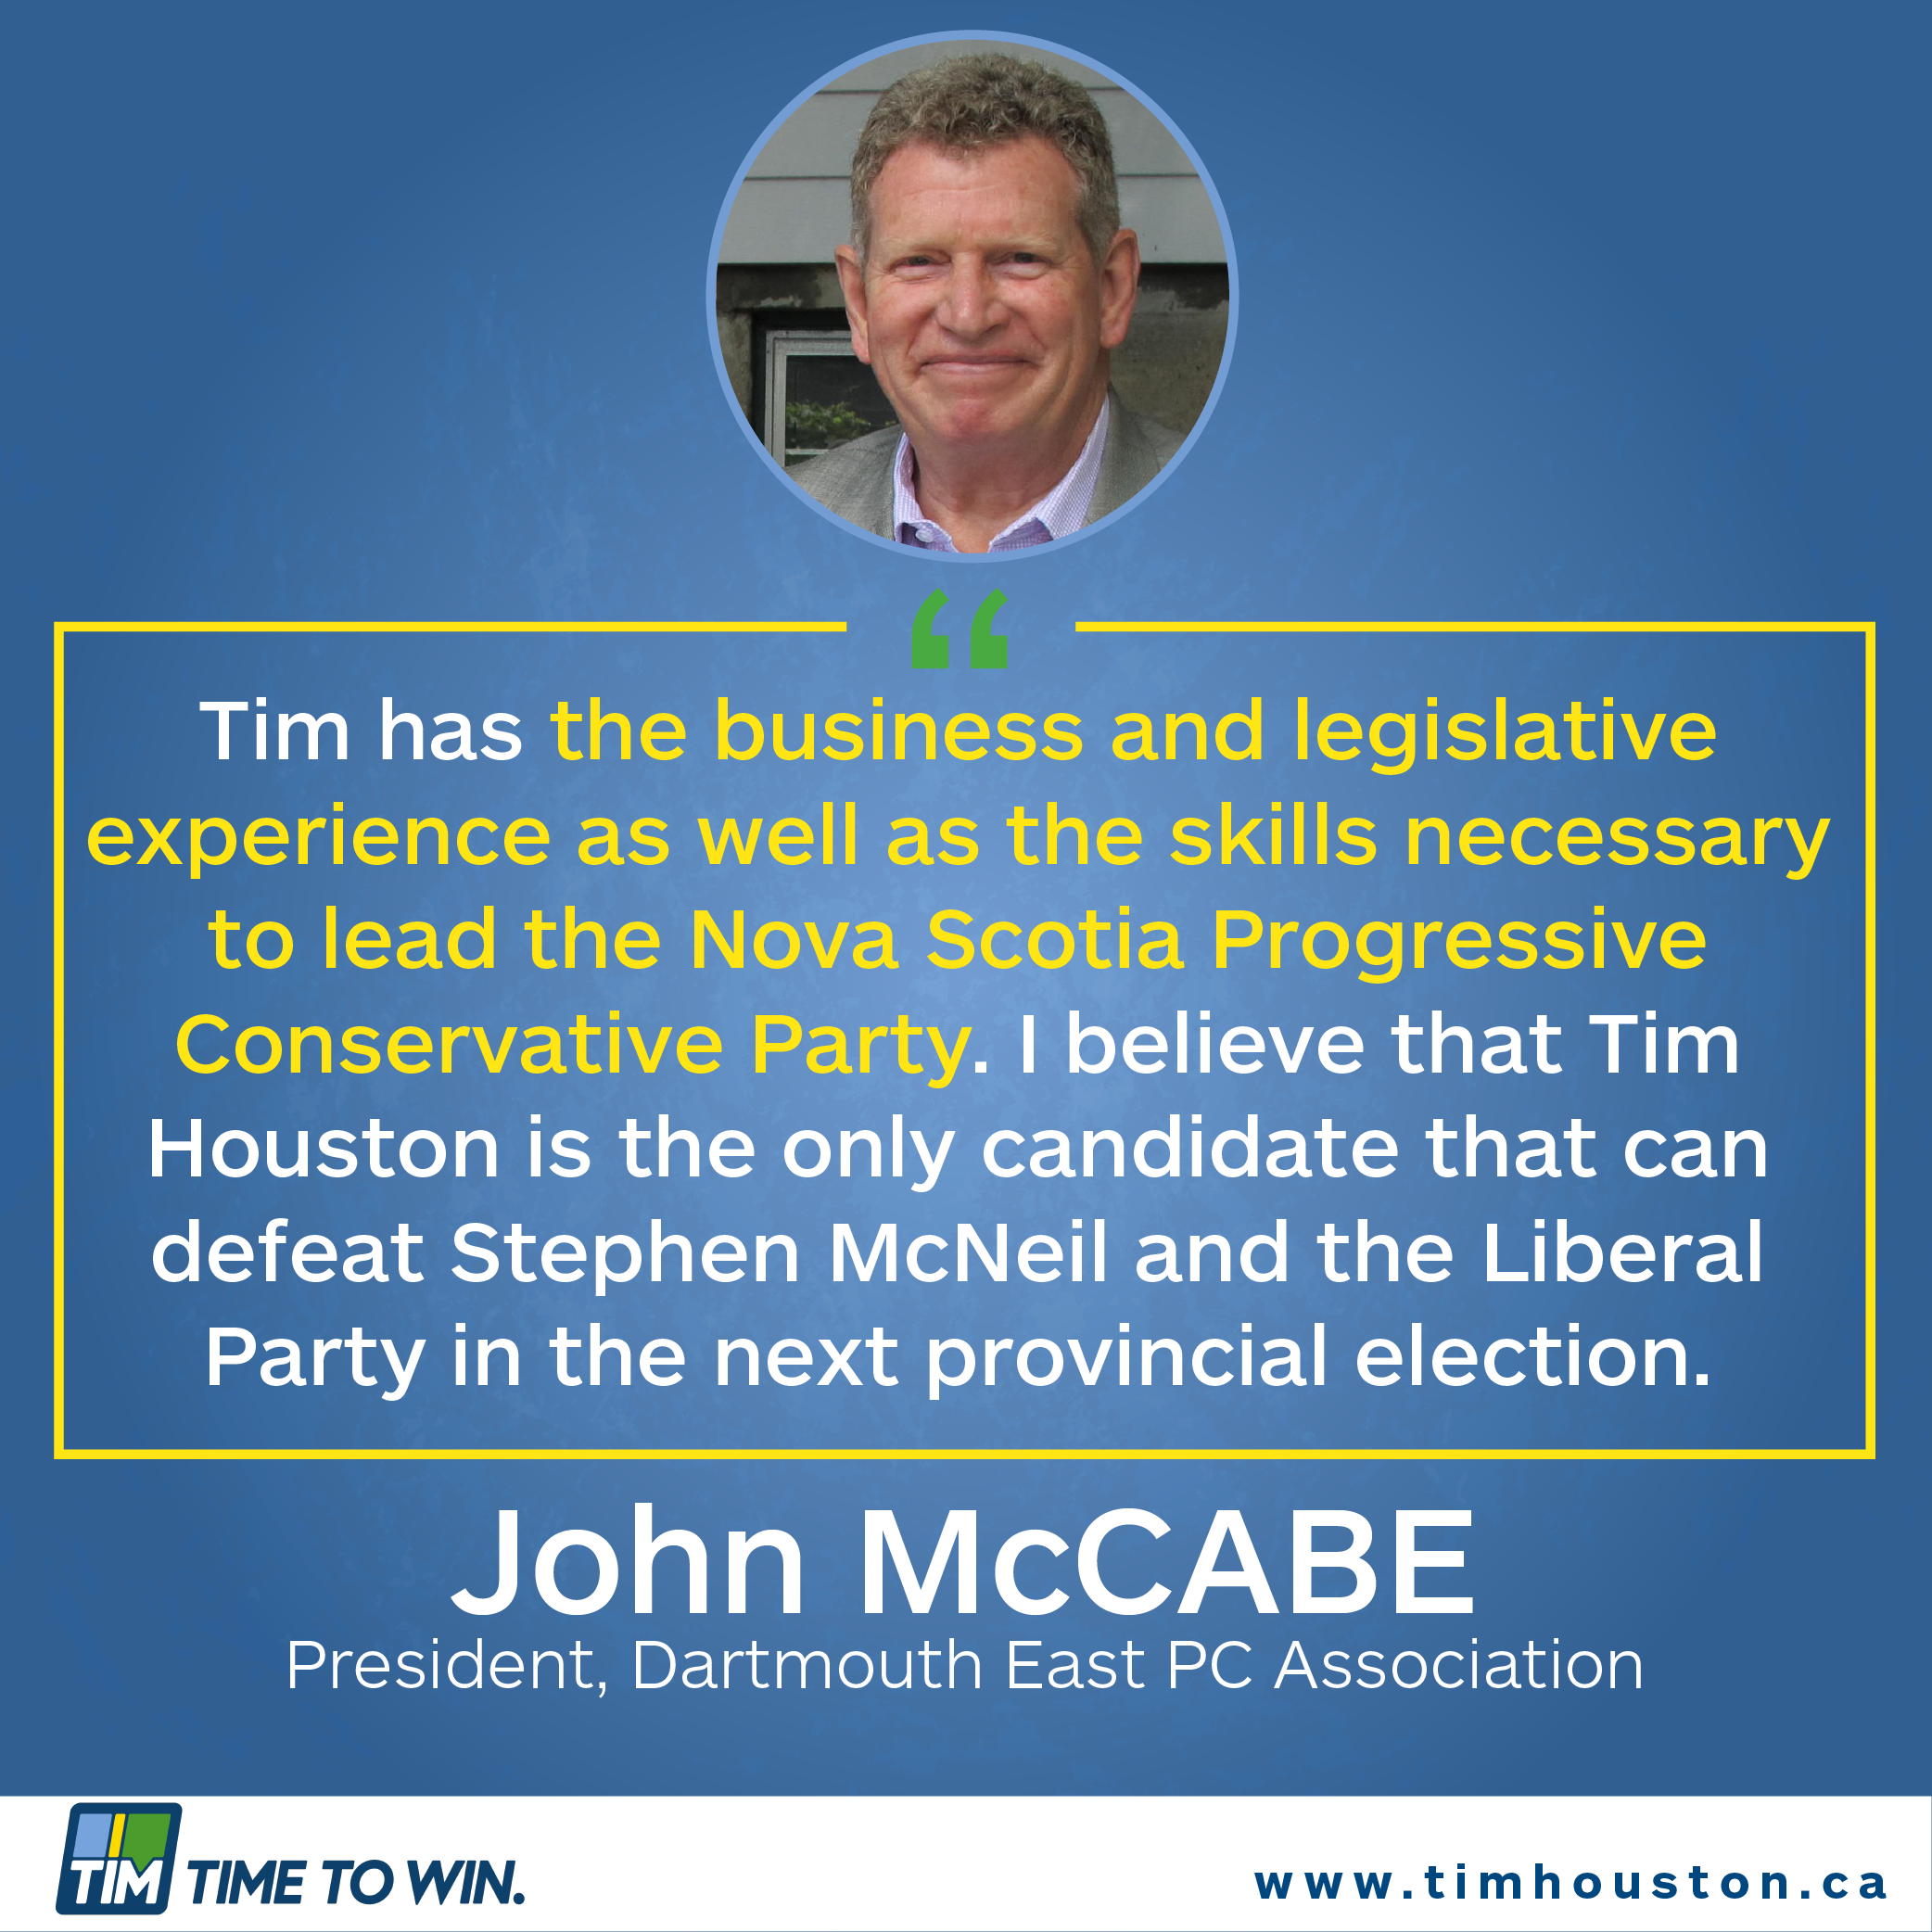 john_mccabe_endorsement-01.png